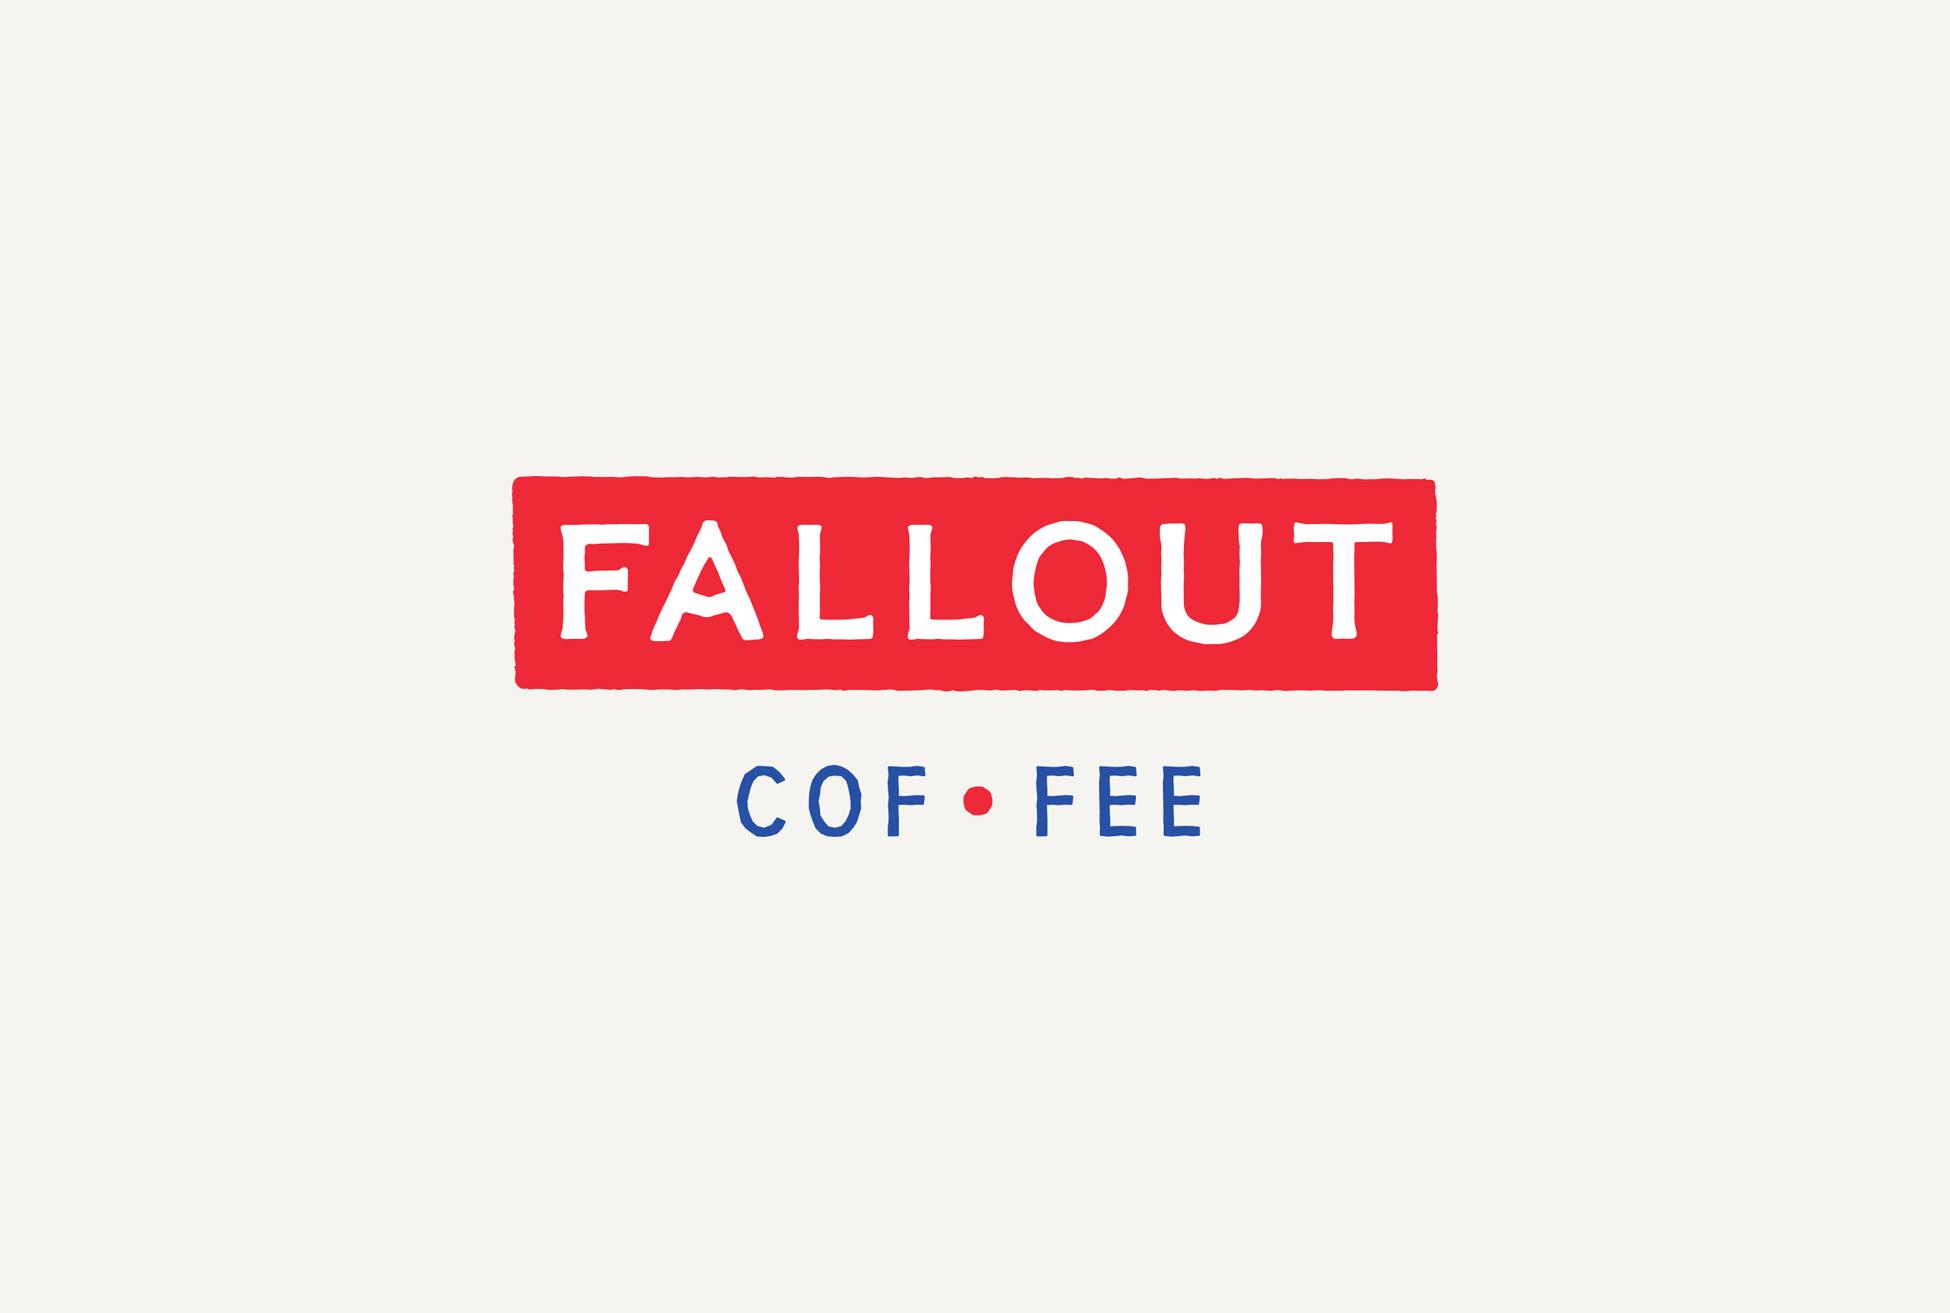 fallout_primary-mark-bar.jpg